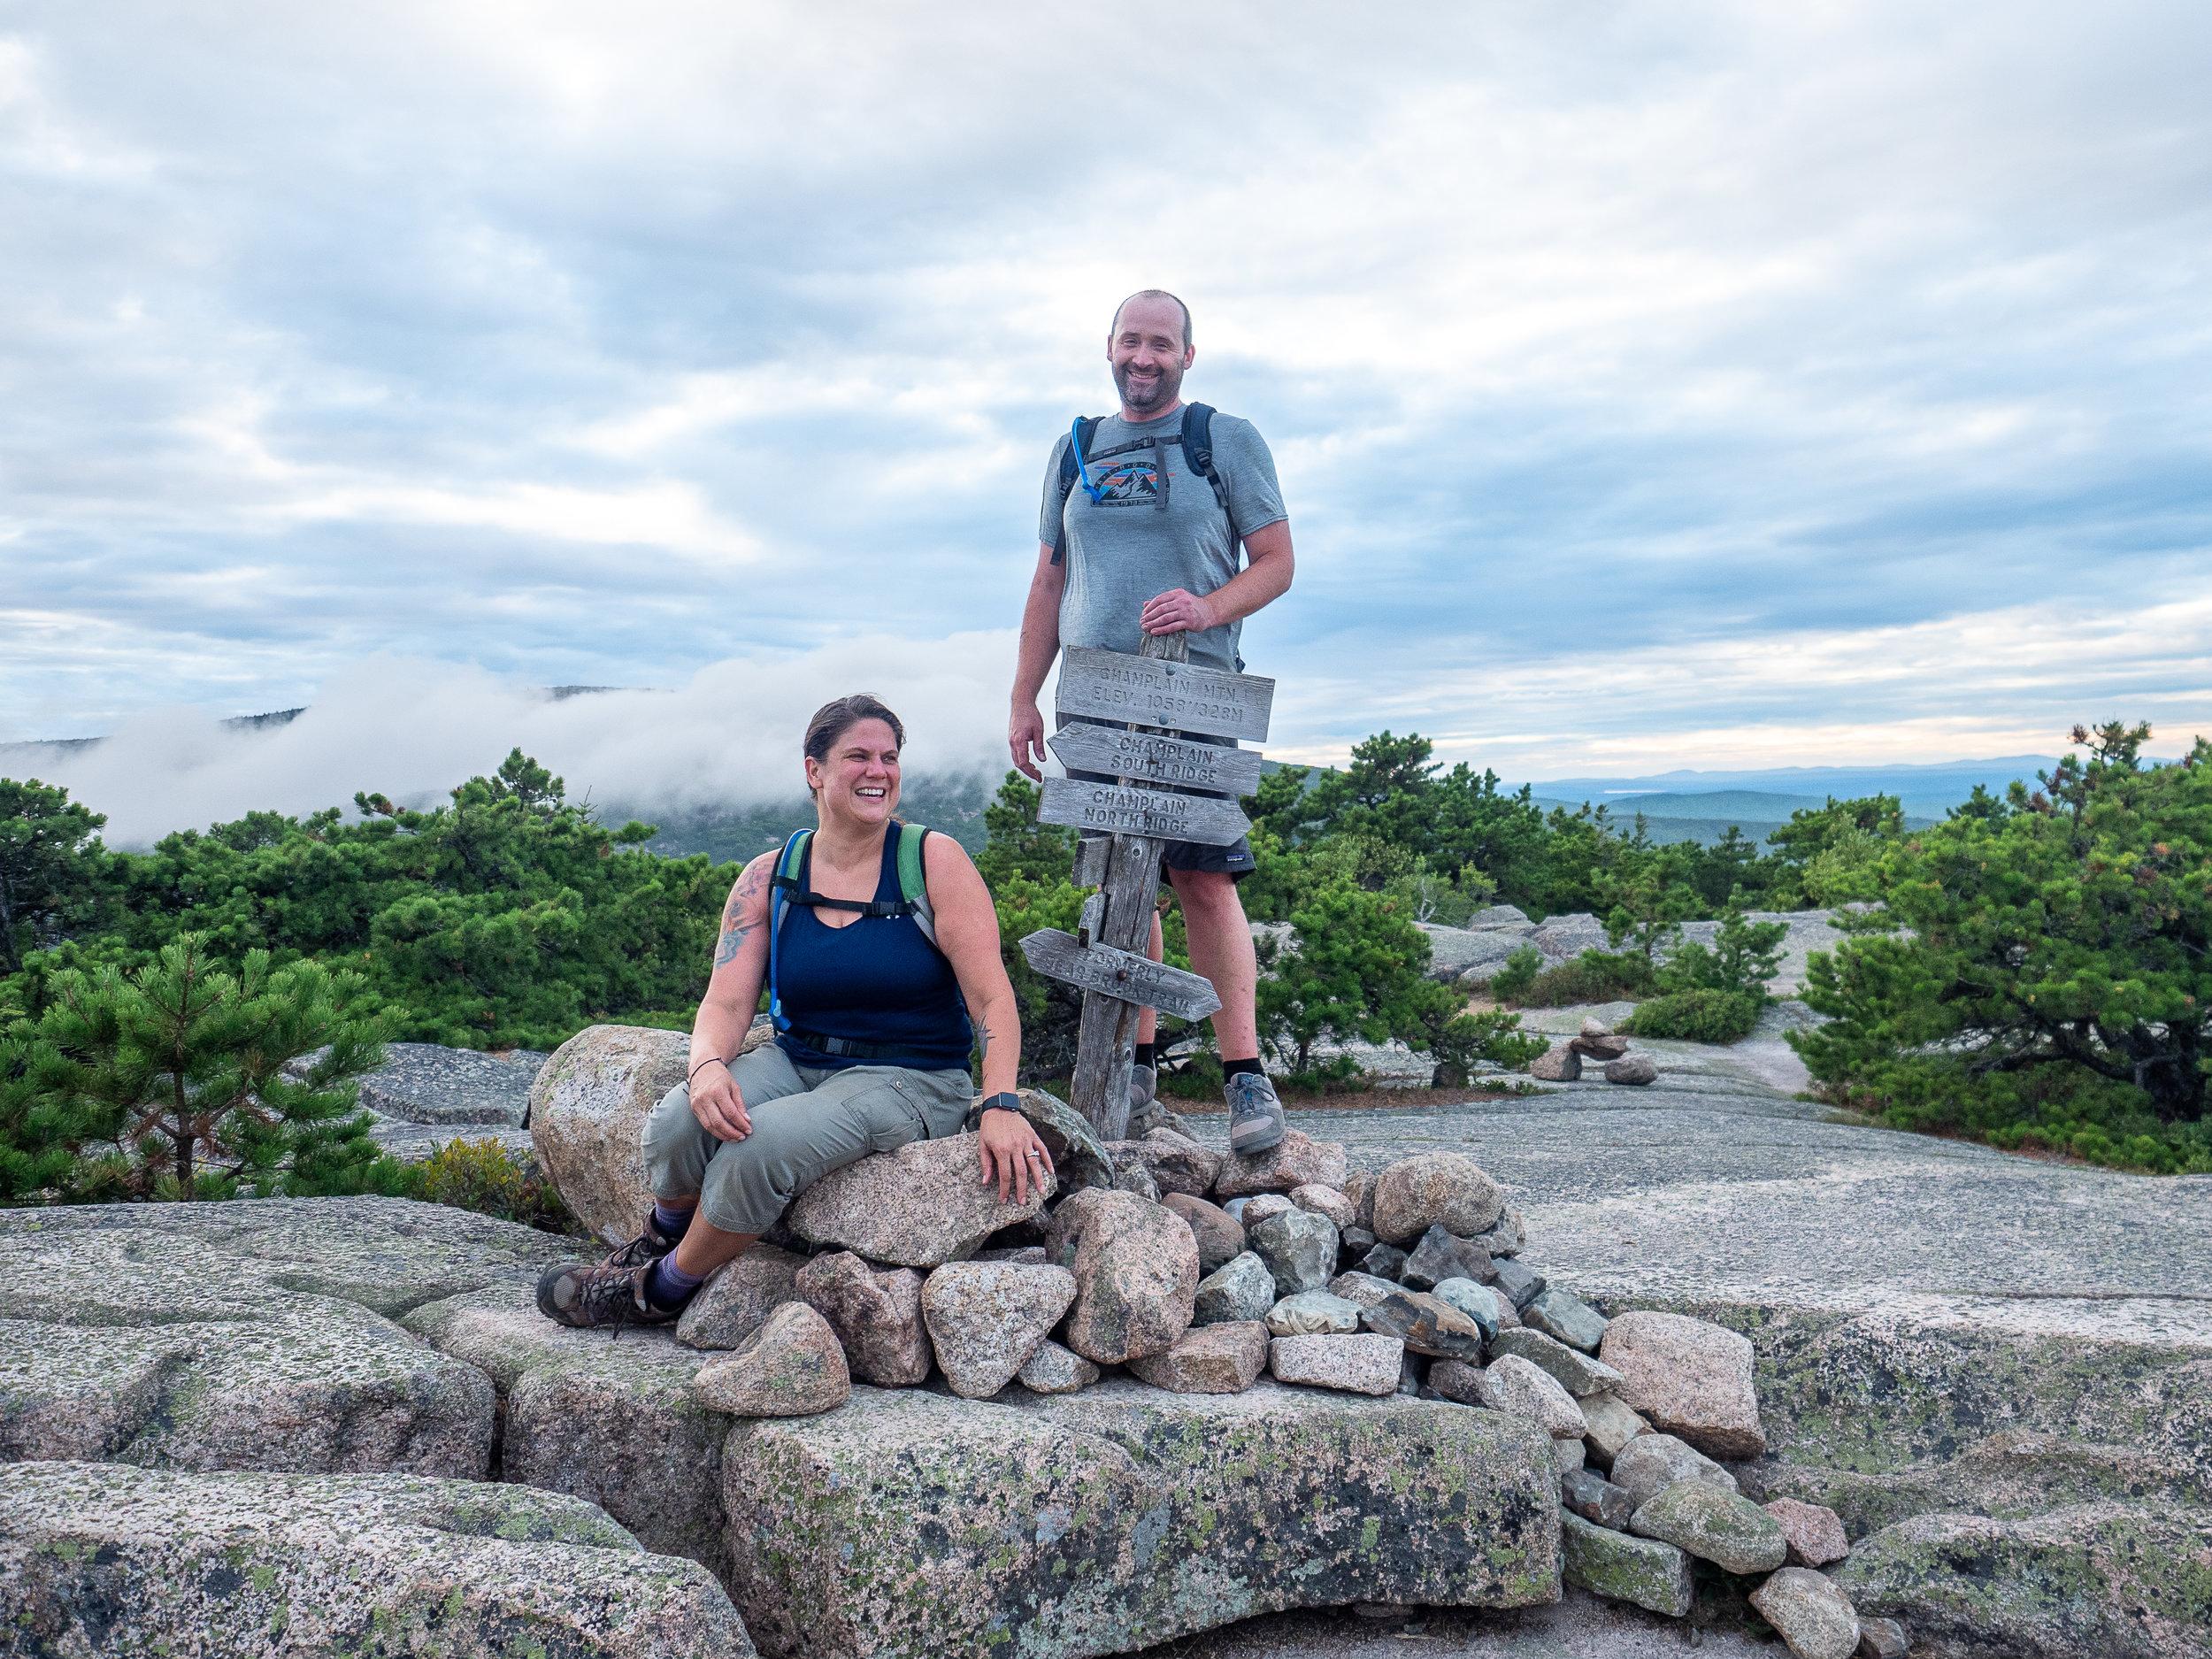 Sam & Brent Gardiner | Precipice Trail, Acadia Nat'l Park, ME | August 2019